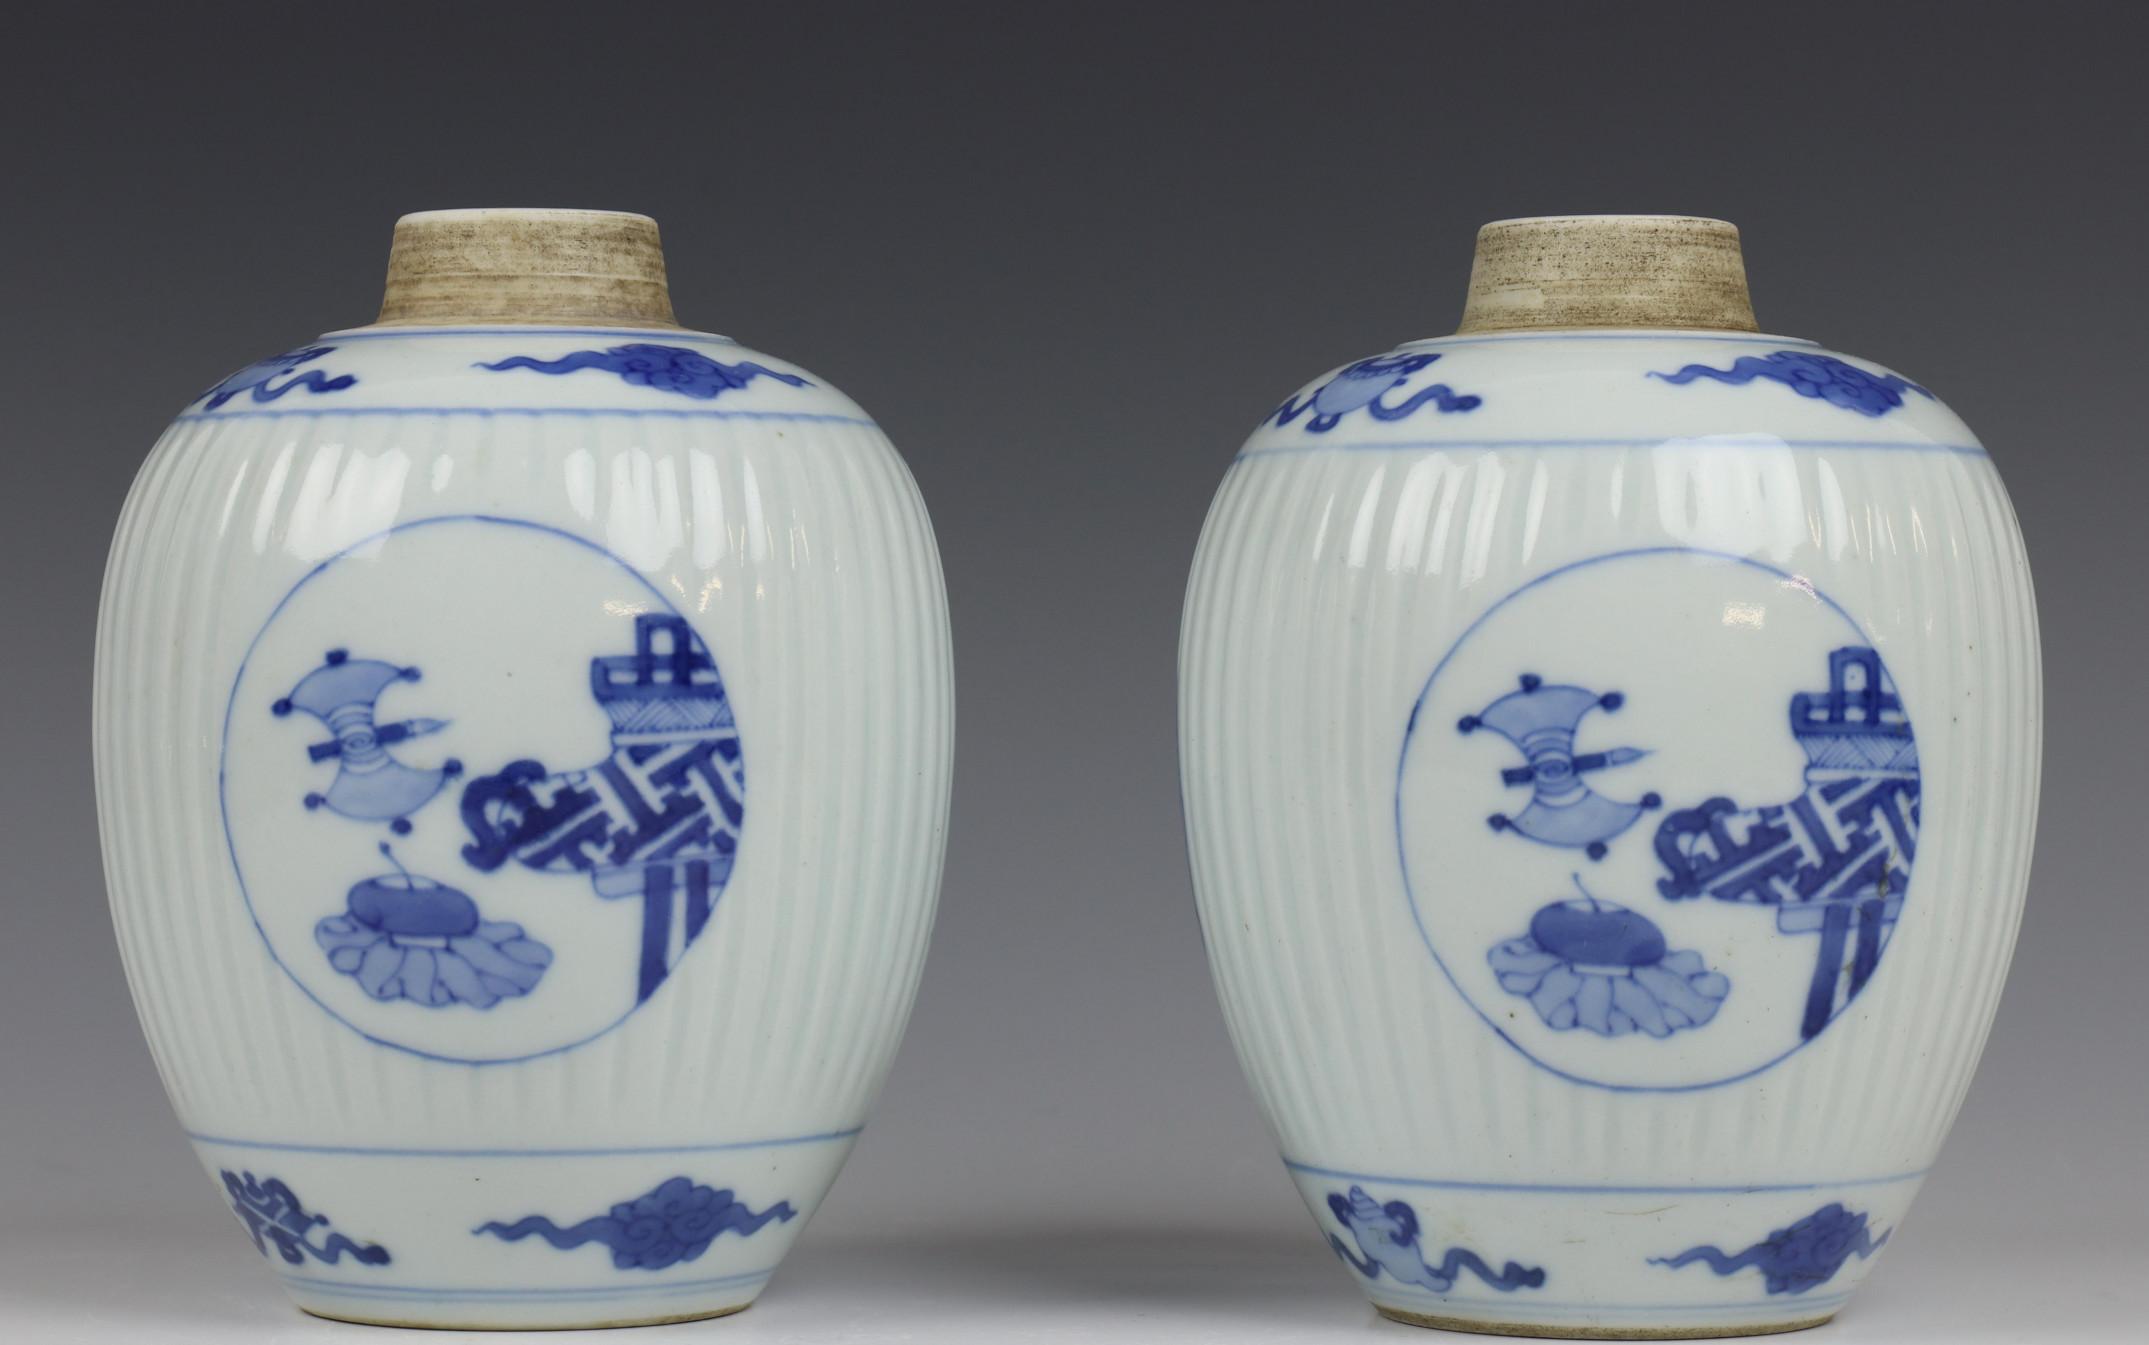 China, paar blauw-wit porseleinen gemberpotten in Kangxi stijl, - Image 3 of 5